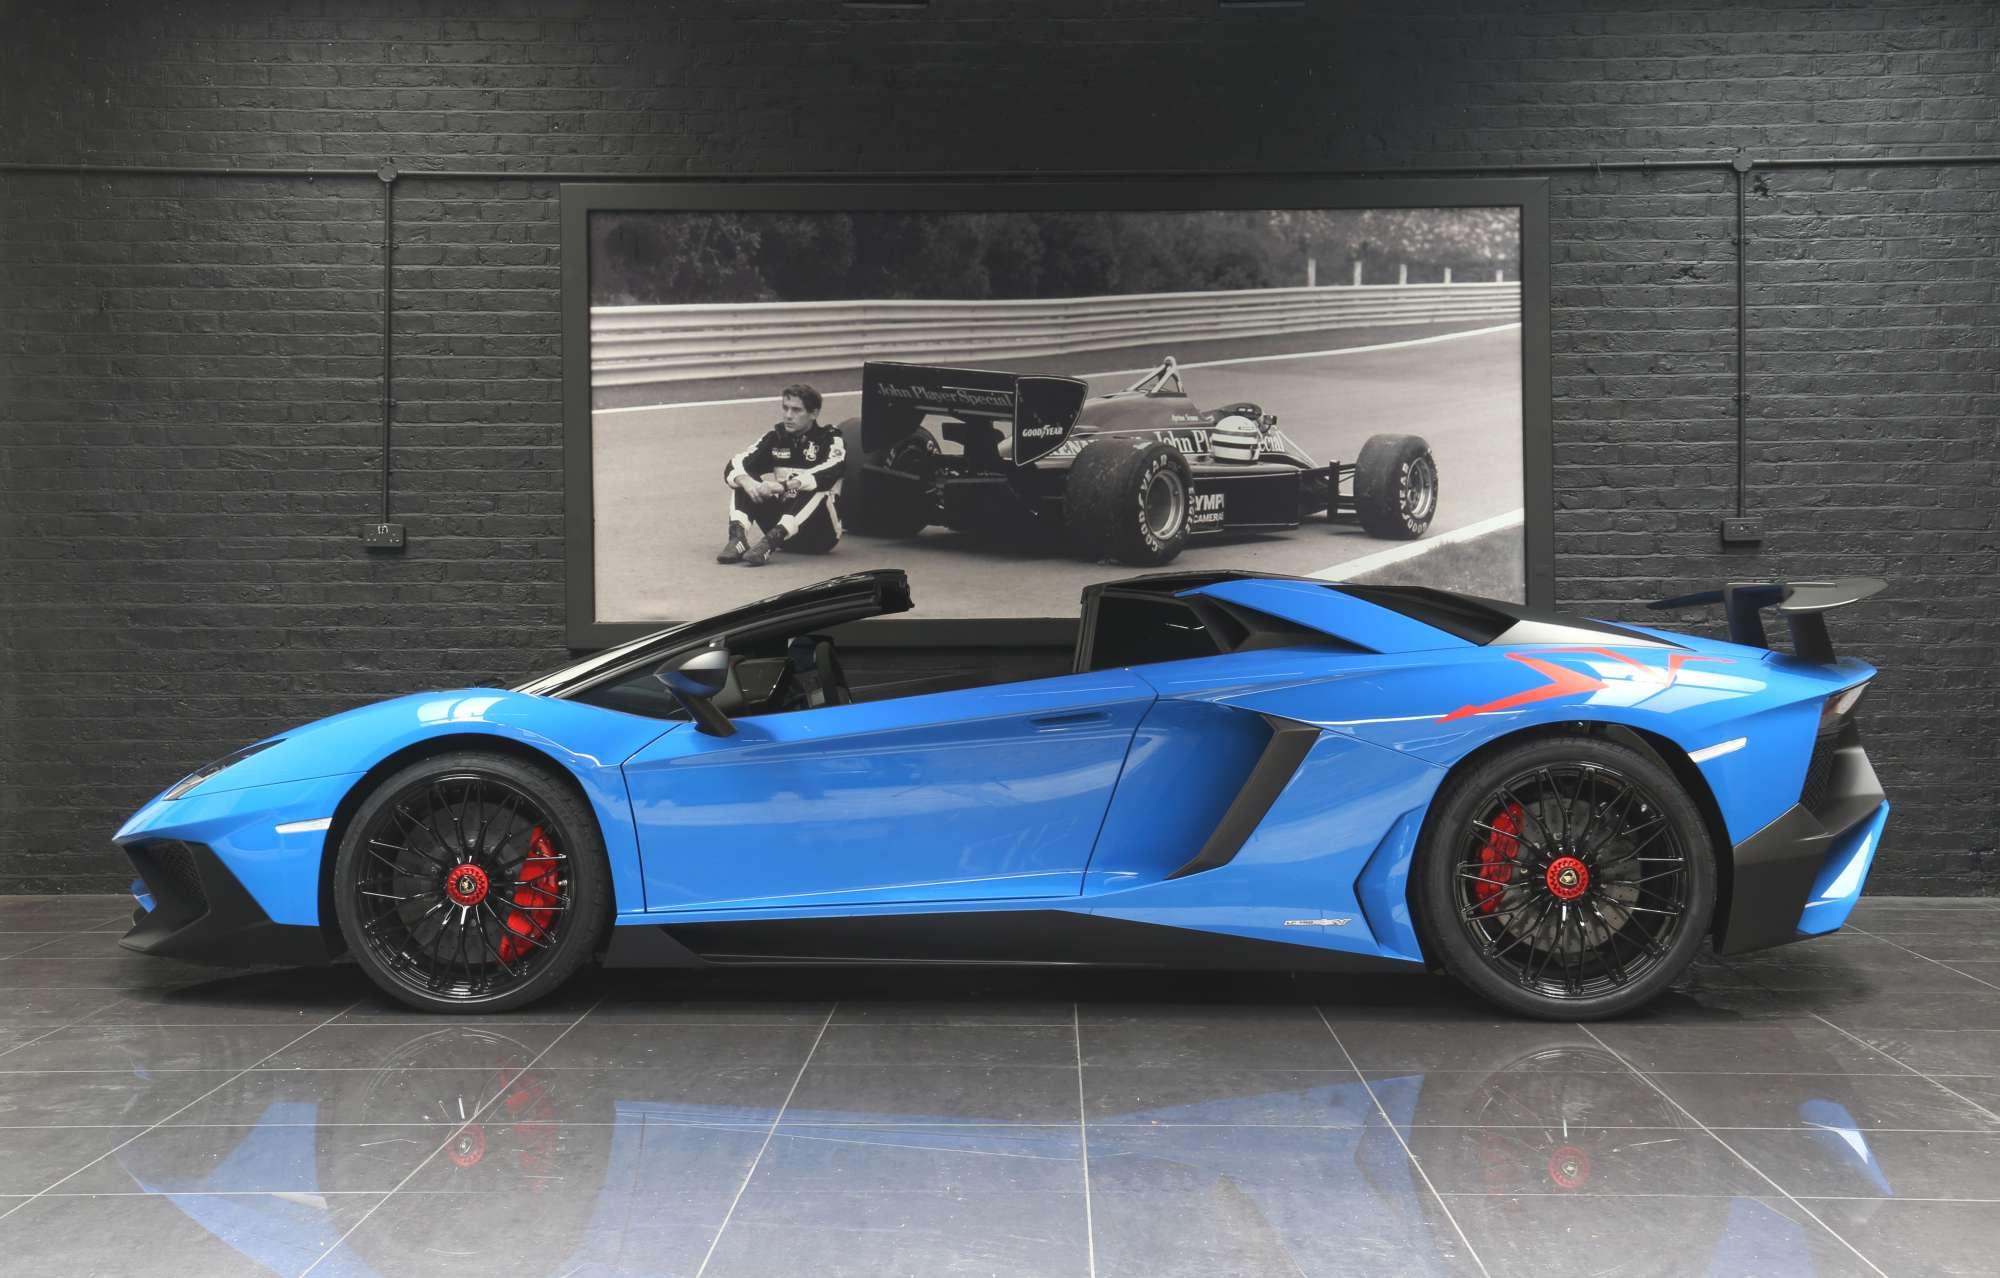 Tesla Model S Interior >> LAMBORGHINI AVENTADOR LP750-4 SV ROADSTER - Pegasus Auto House